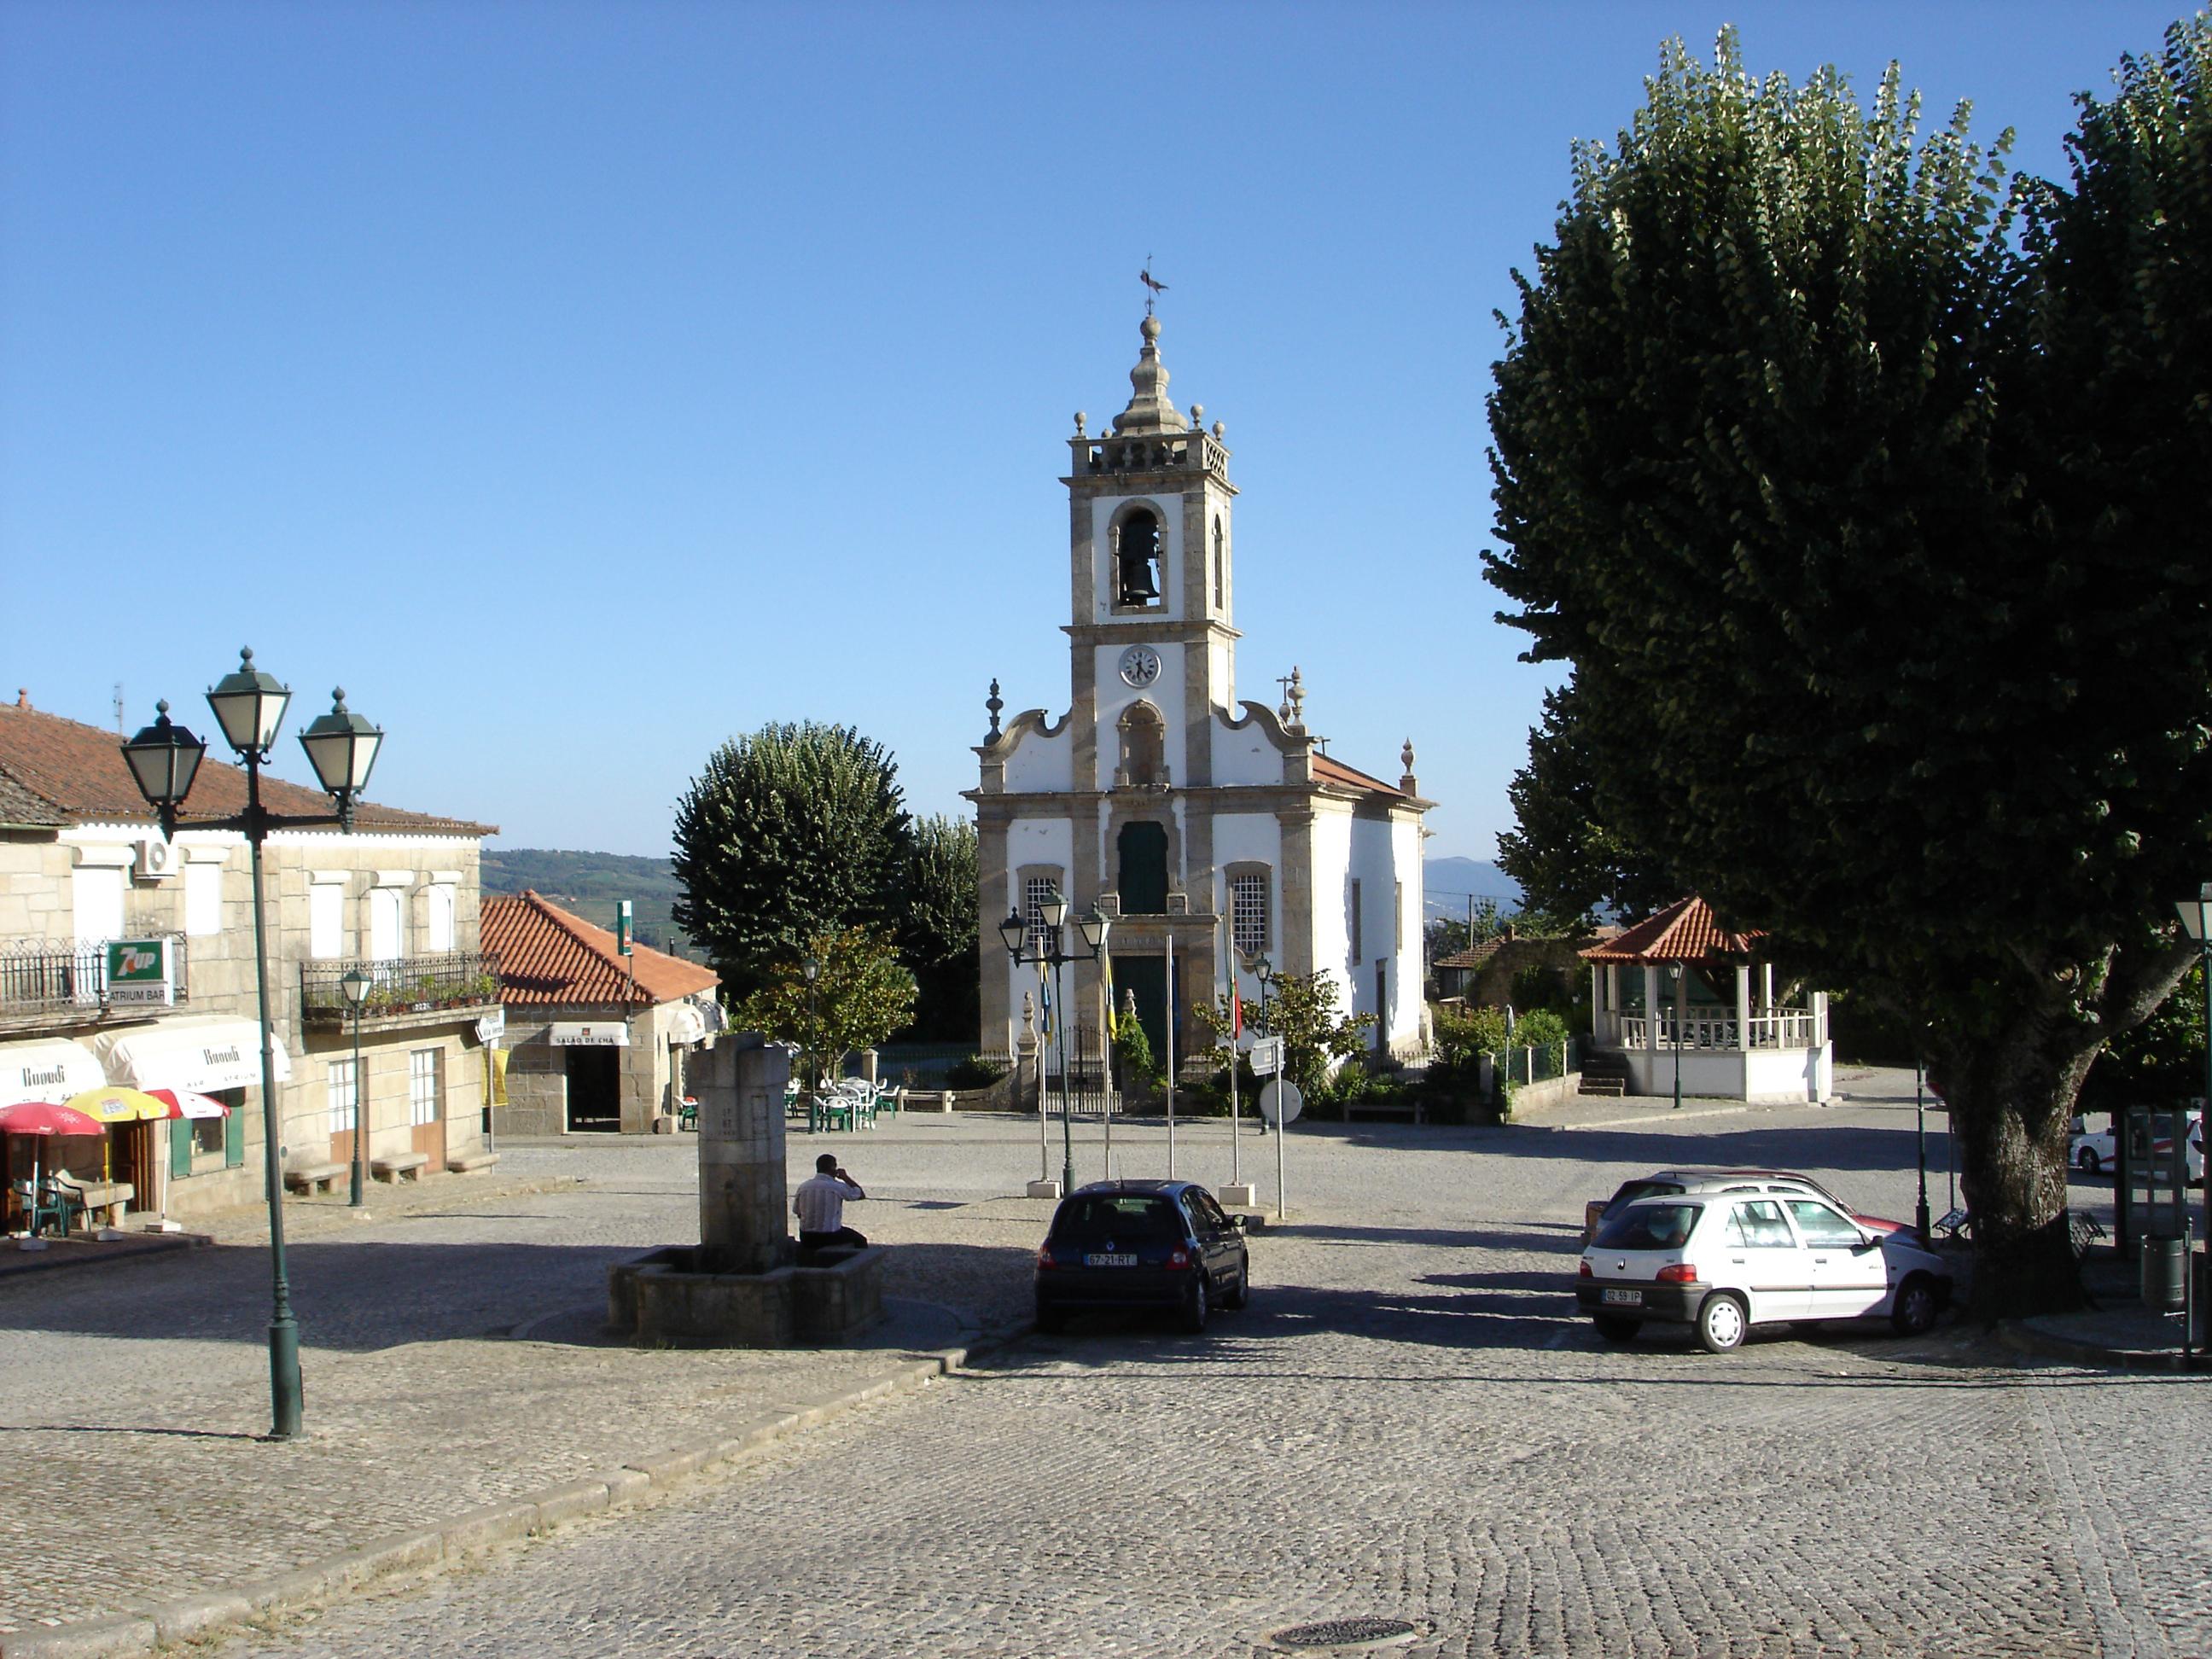 Vilar de Macada City